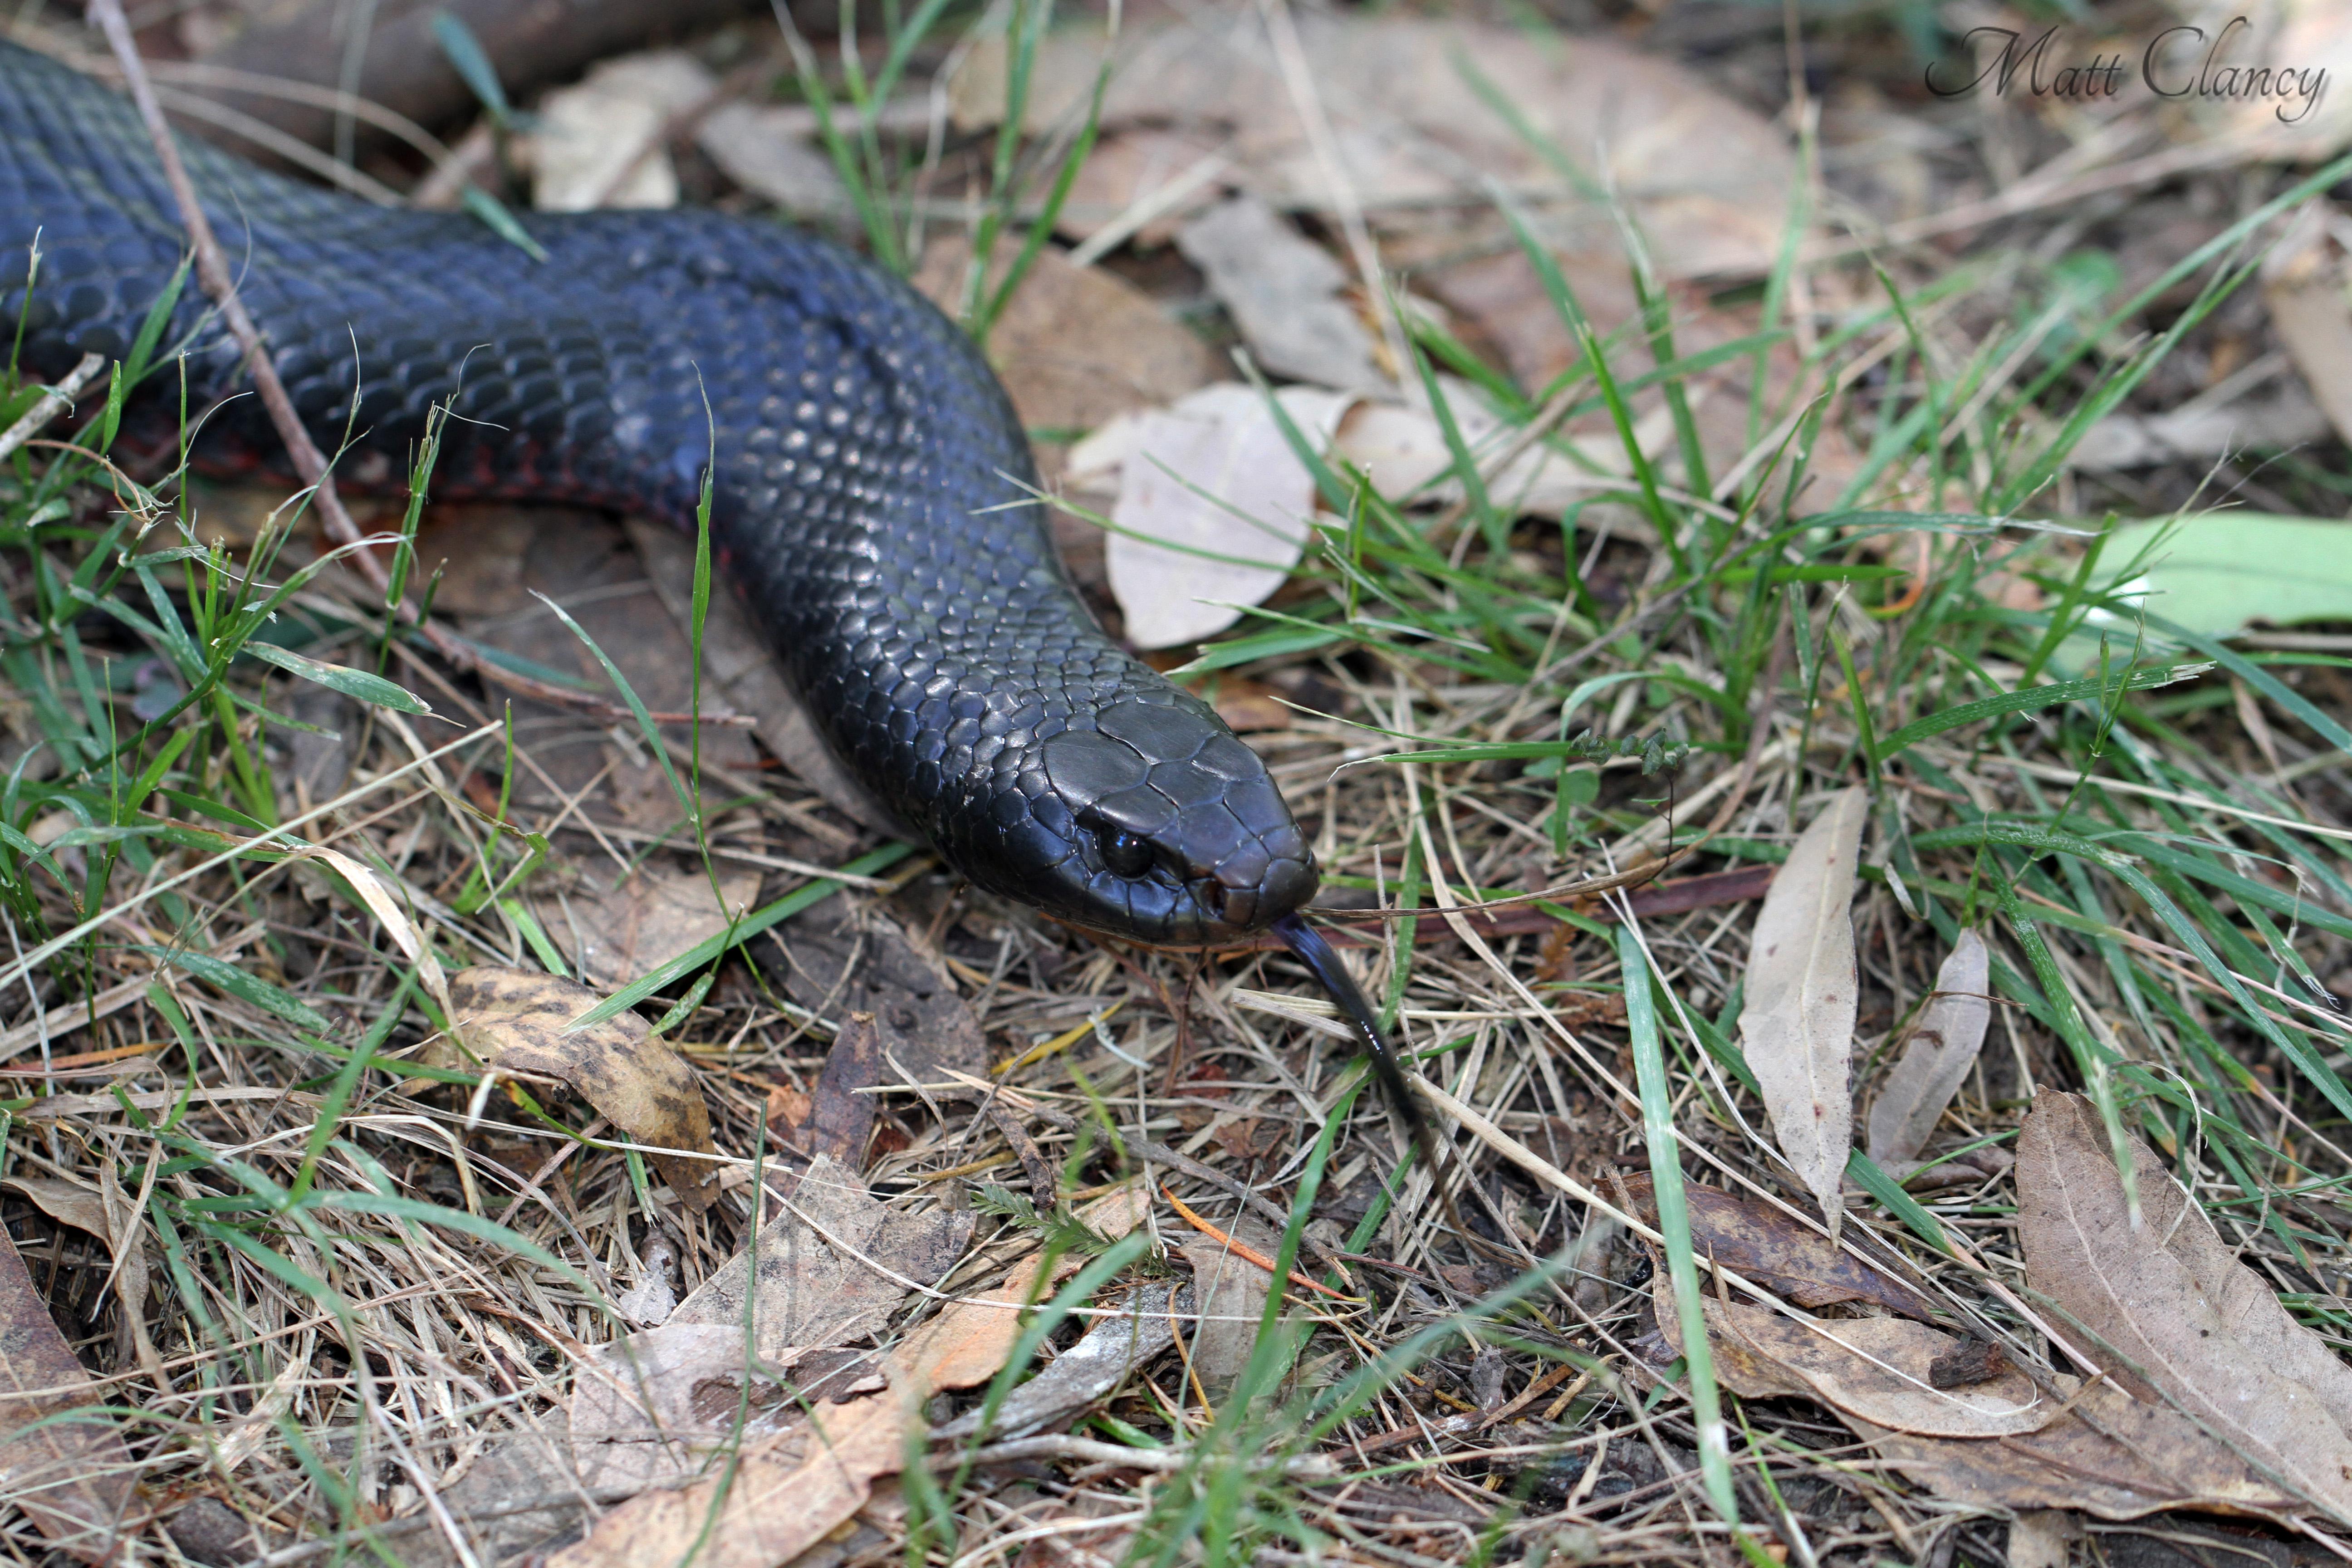 Red-bellied Black Snake svg #4, Download drawings